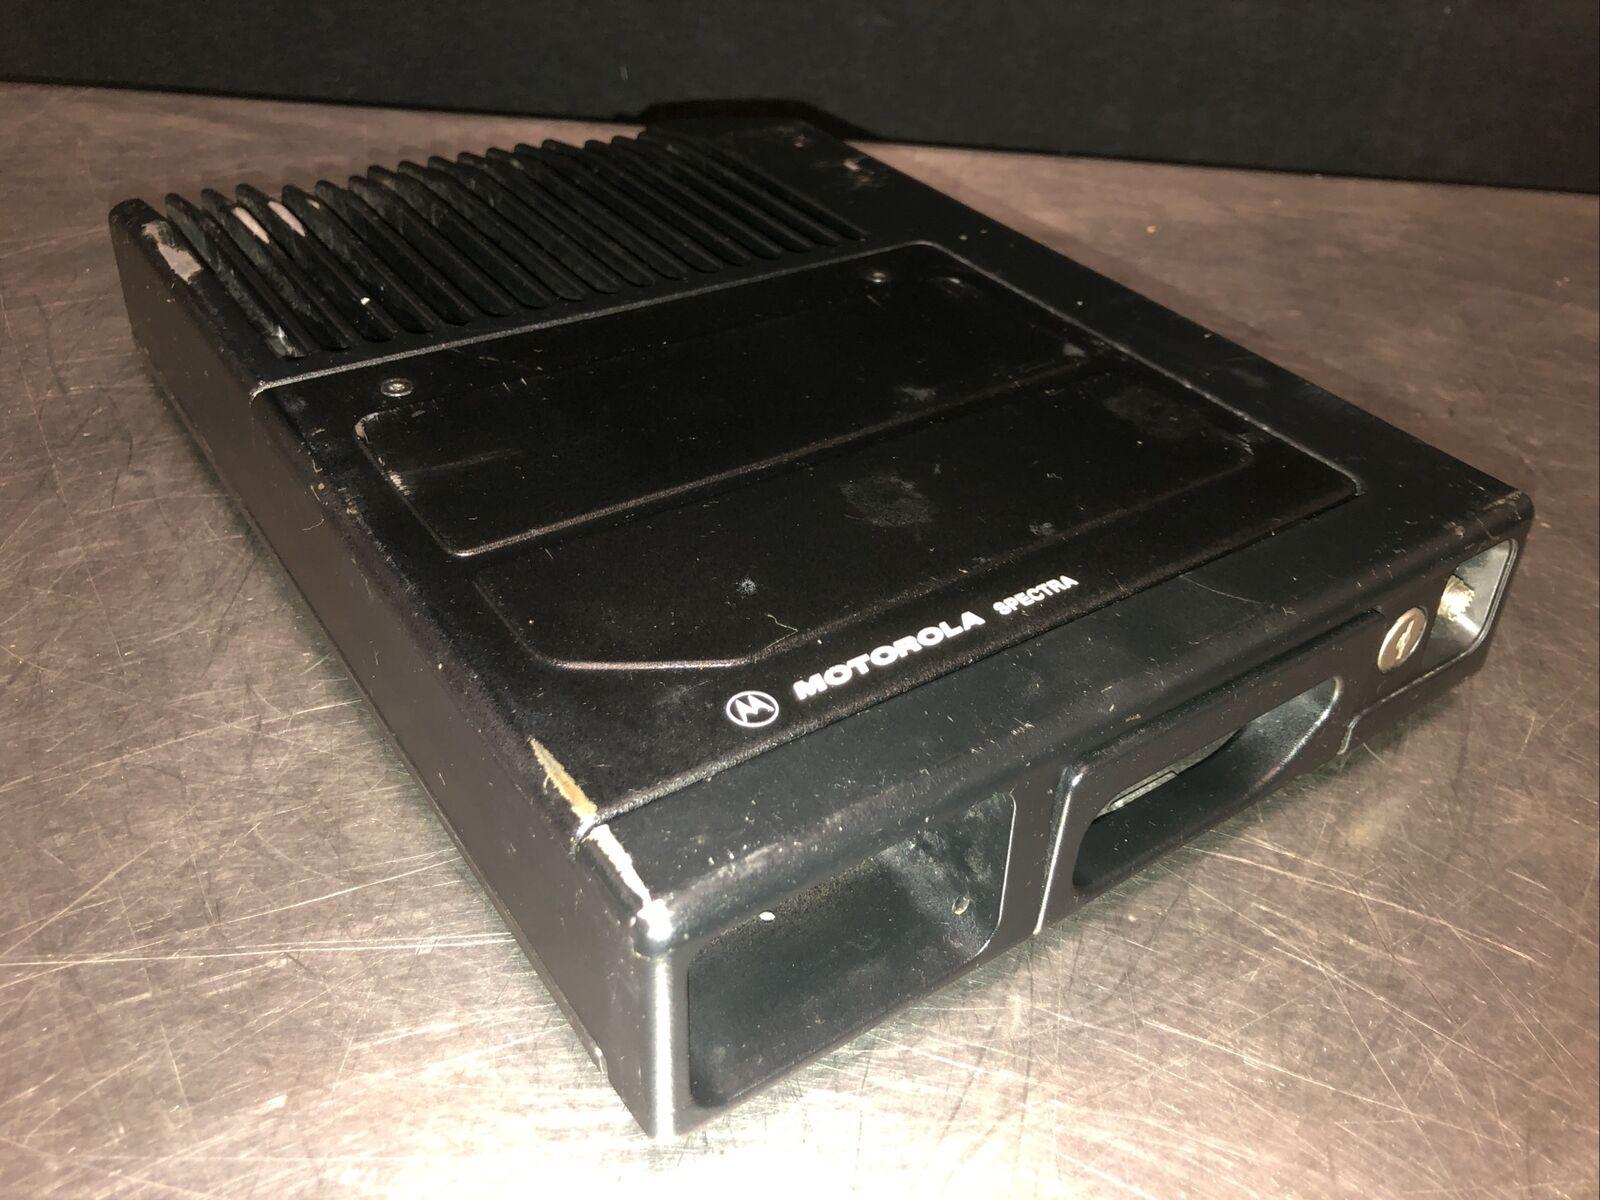 Motorola Spectra Radio Model No TA9FW+079W. Buy it now for 99.99